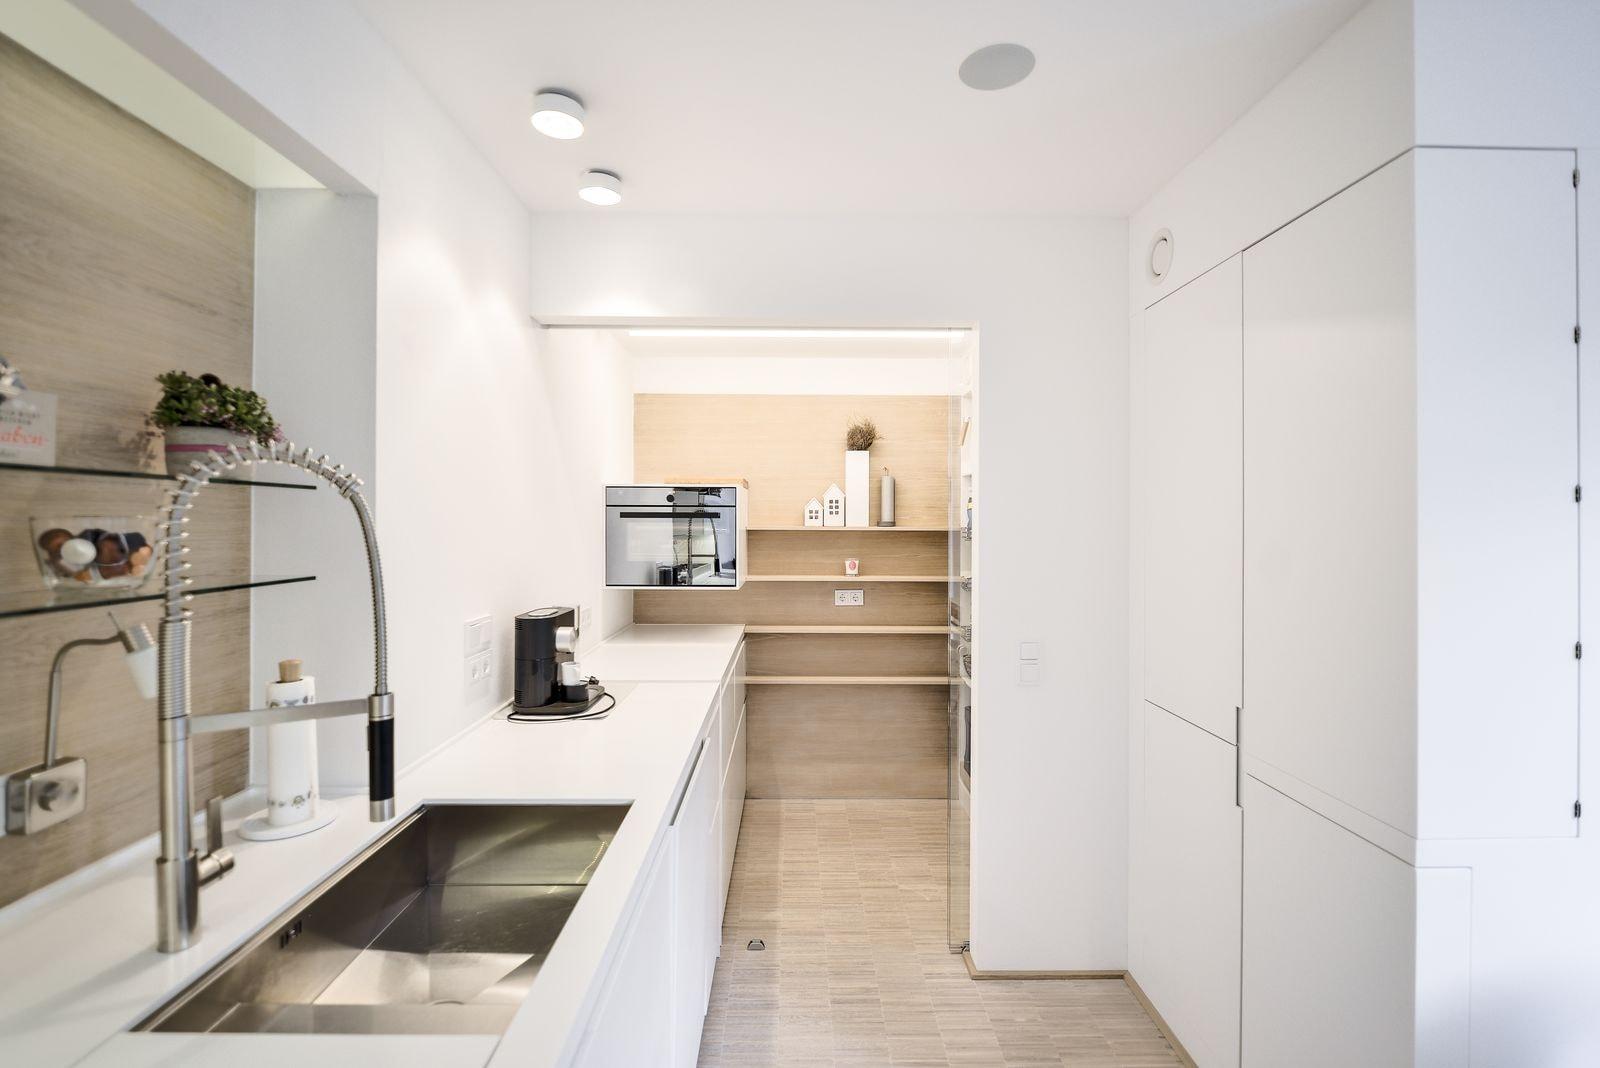 plan 3 kuchyně / Реконструкция надземного бункера в Зингене / Квартира W